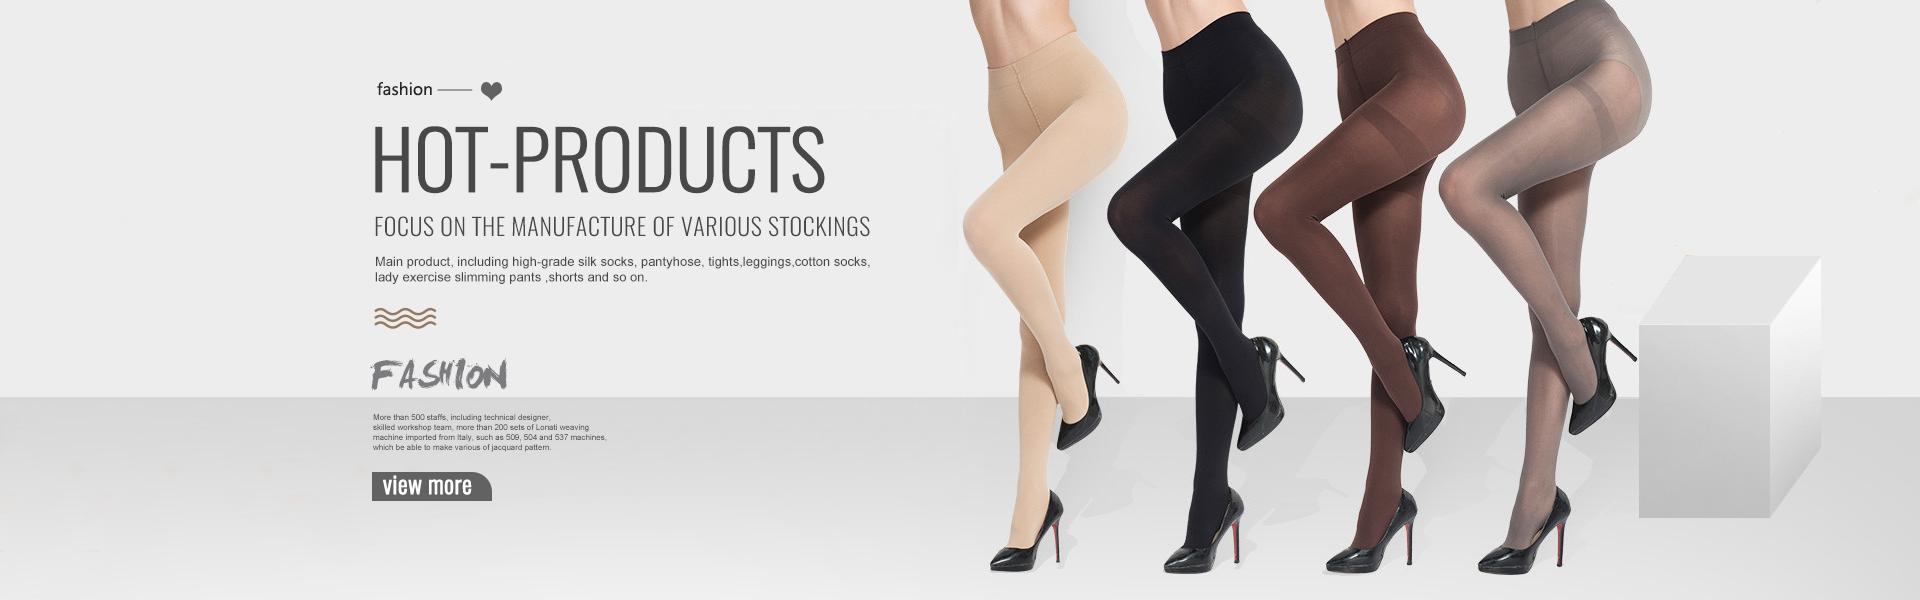 2e6ba74113d Fashionable jacquard dots yellow stocking girl japanese printed pantyhose.  Leggings